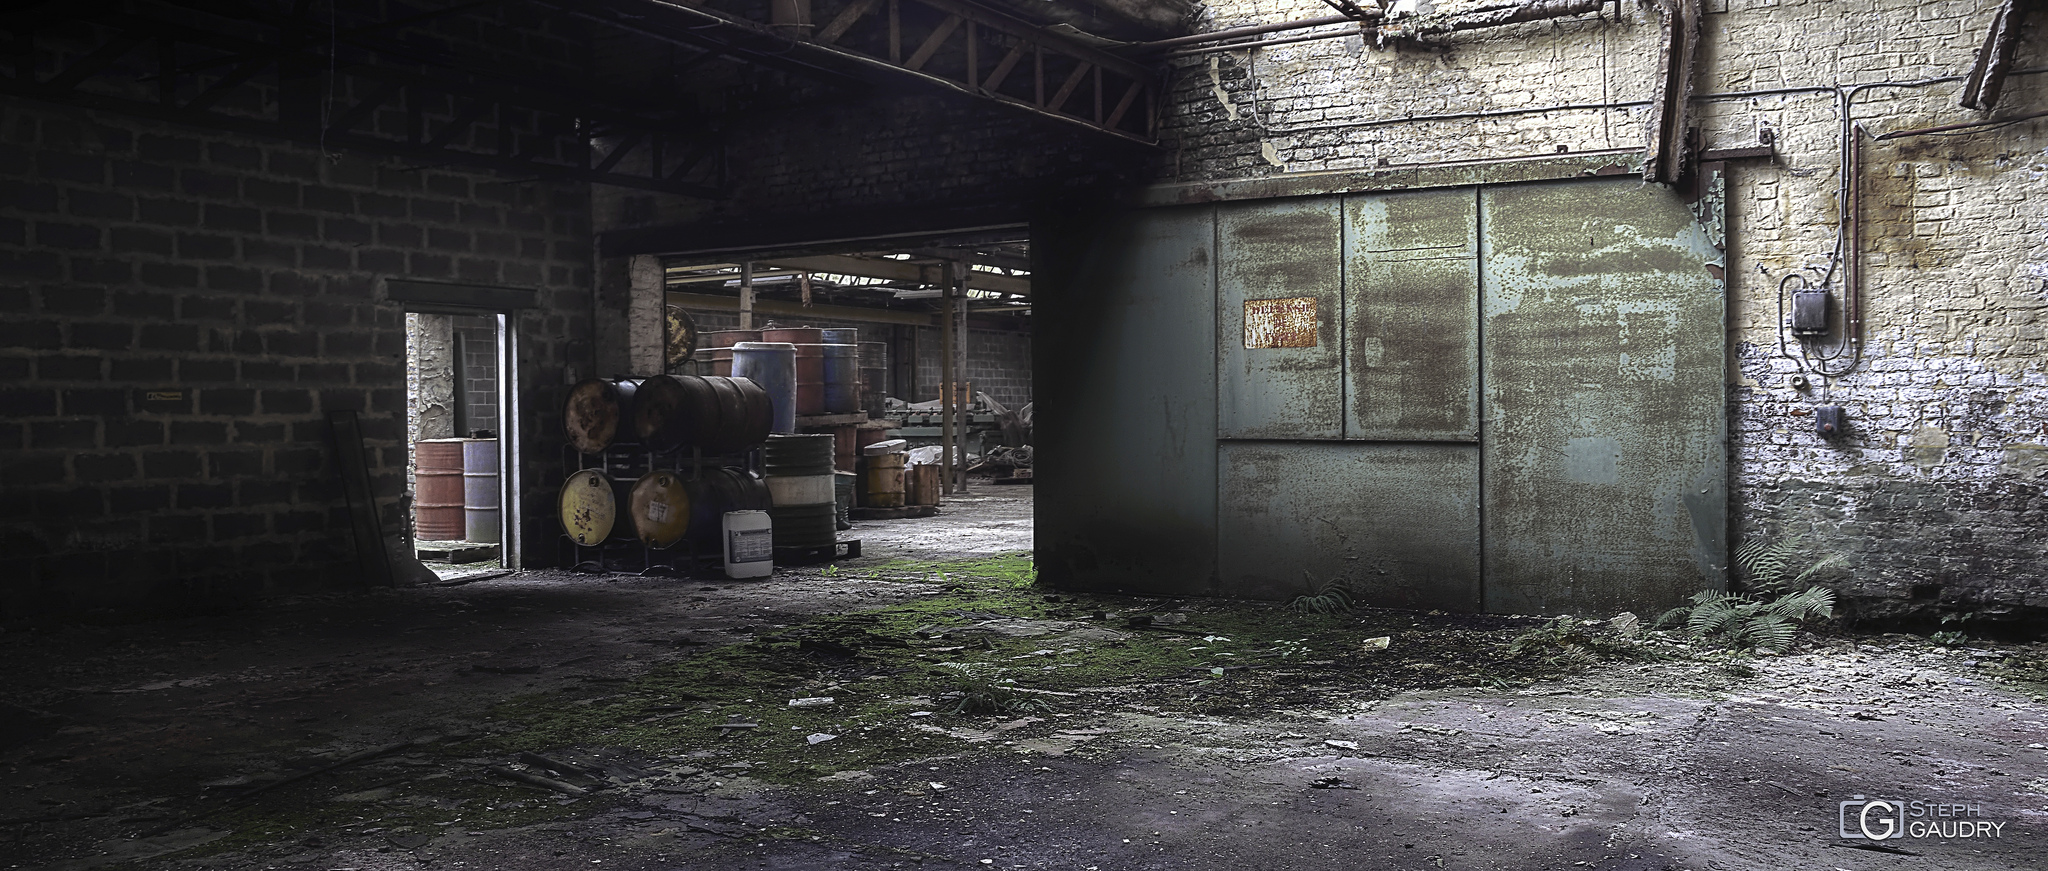 Garage Imperia - les hangars vides [Klik om de diavoorstelling te starten]